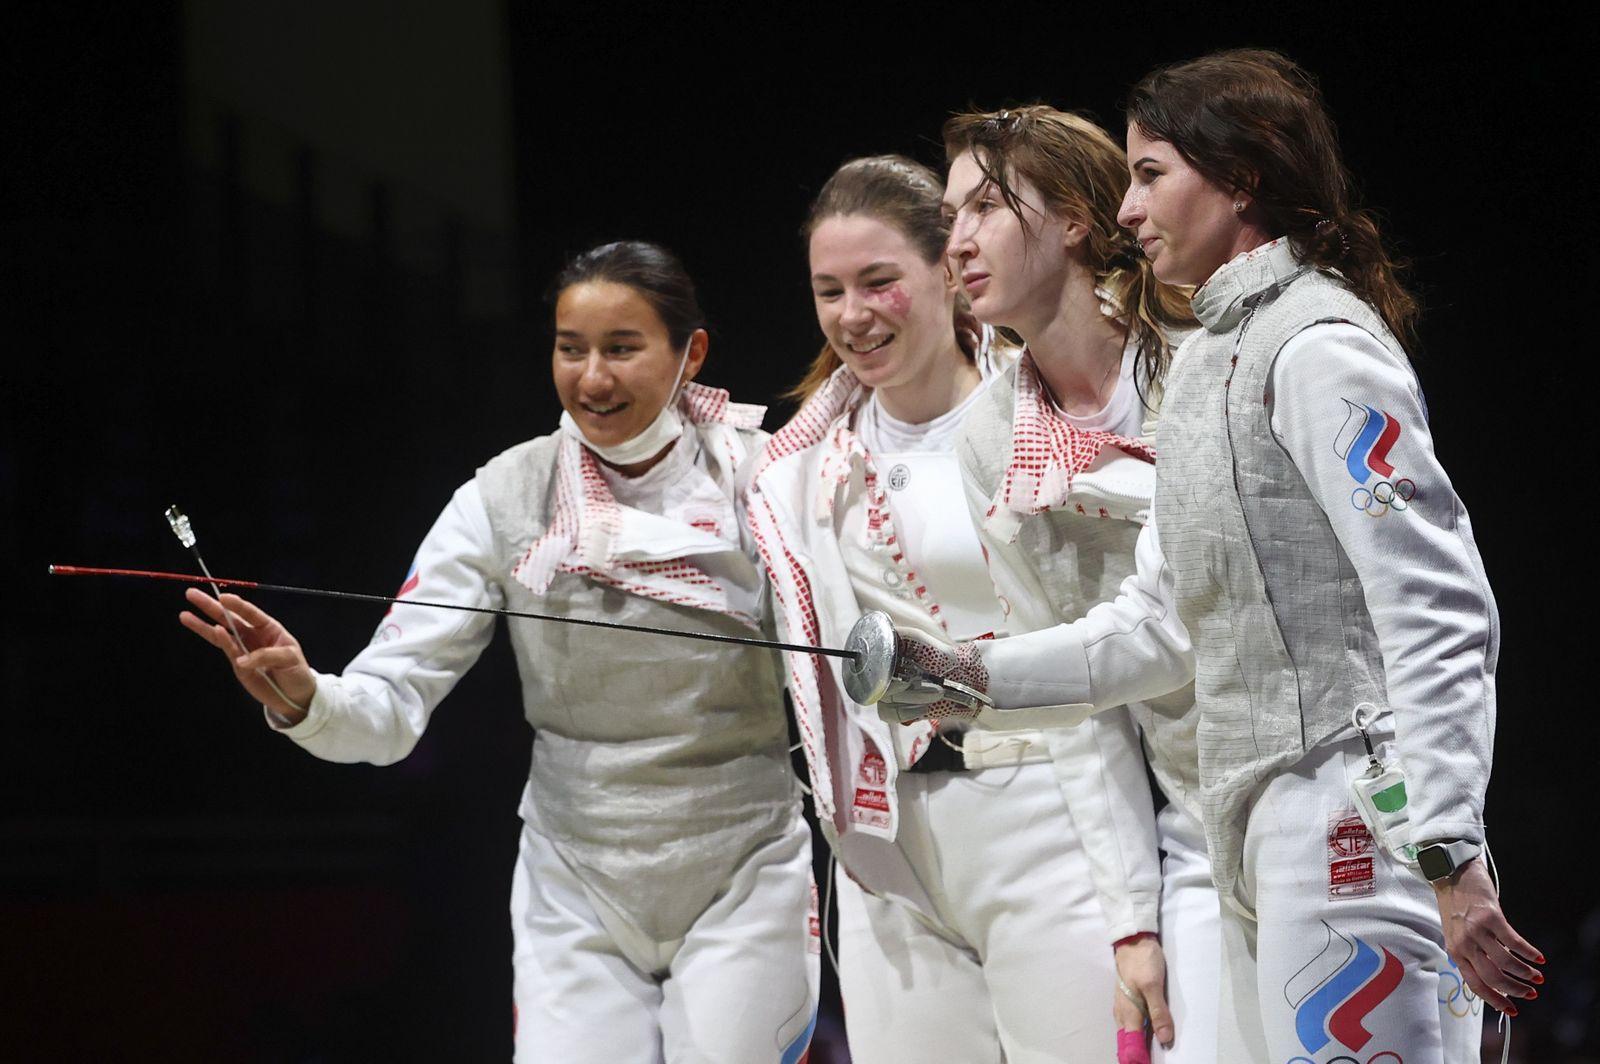 Fencing - Women's Team Foil - Semifinal